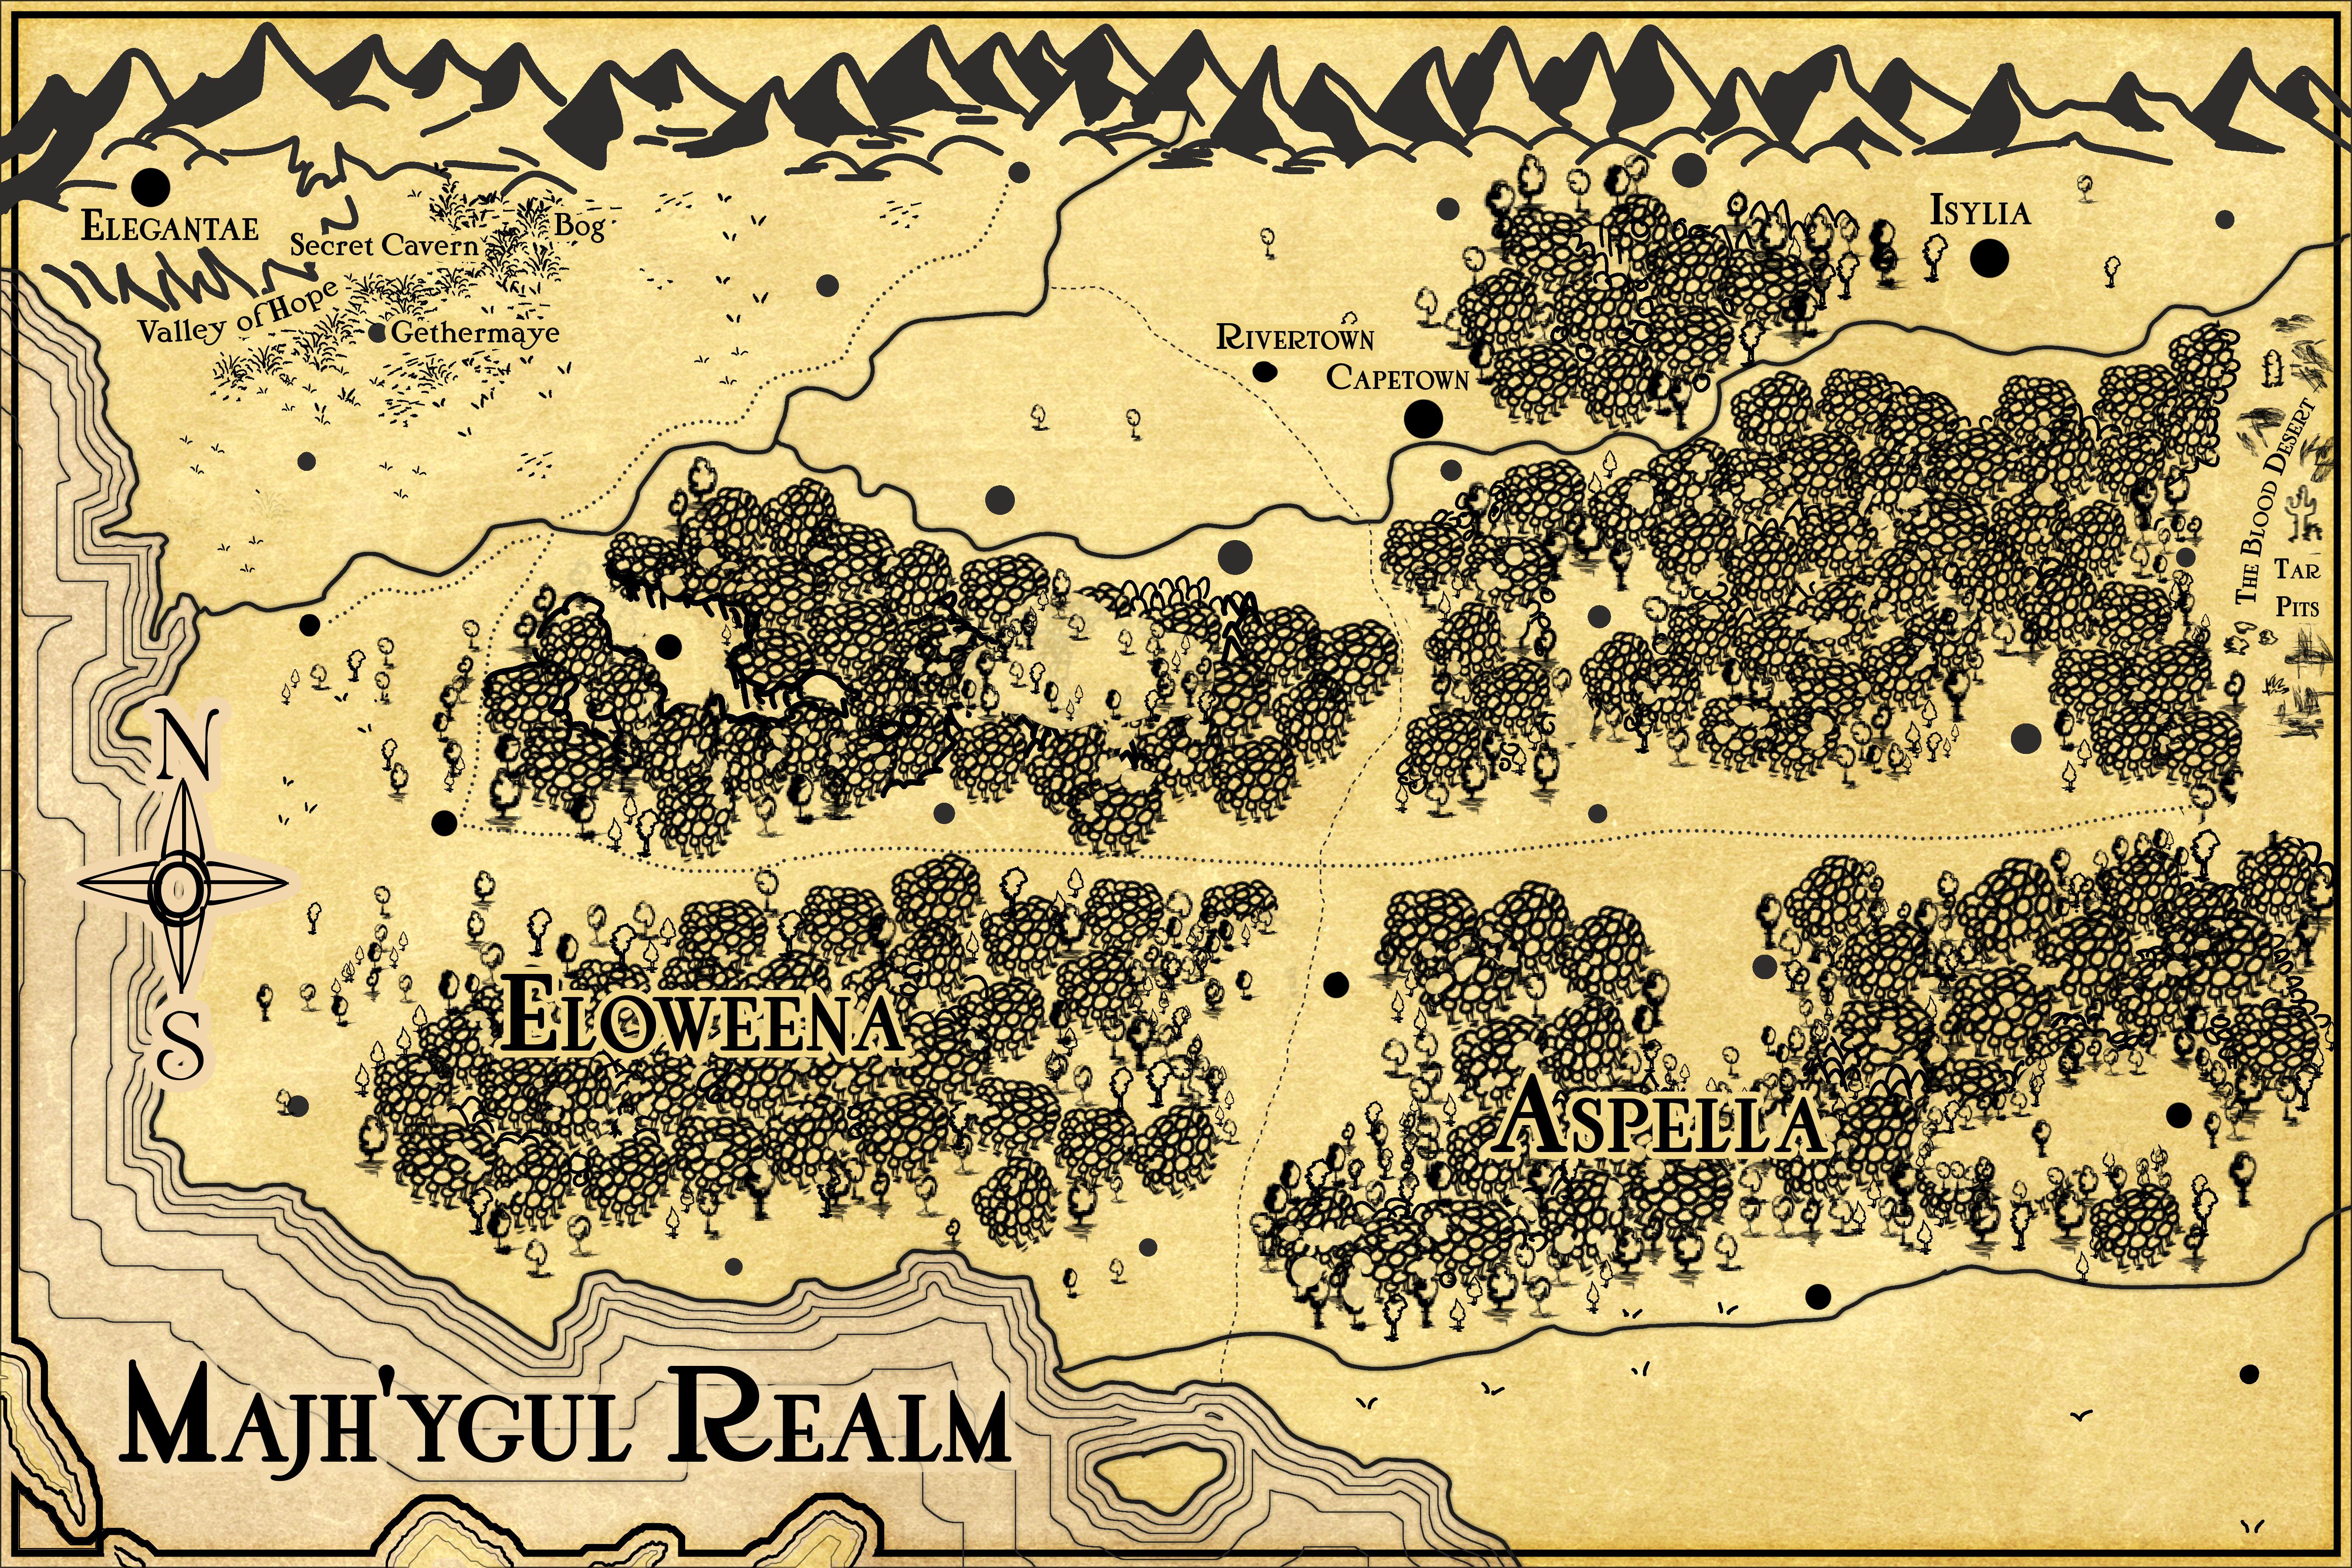 J.R.R. Tolkien Lord of the Rings inspired map insert for fantasy novel